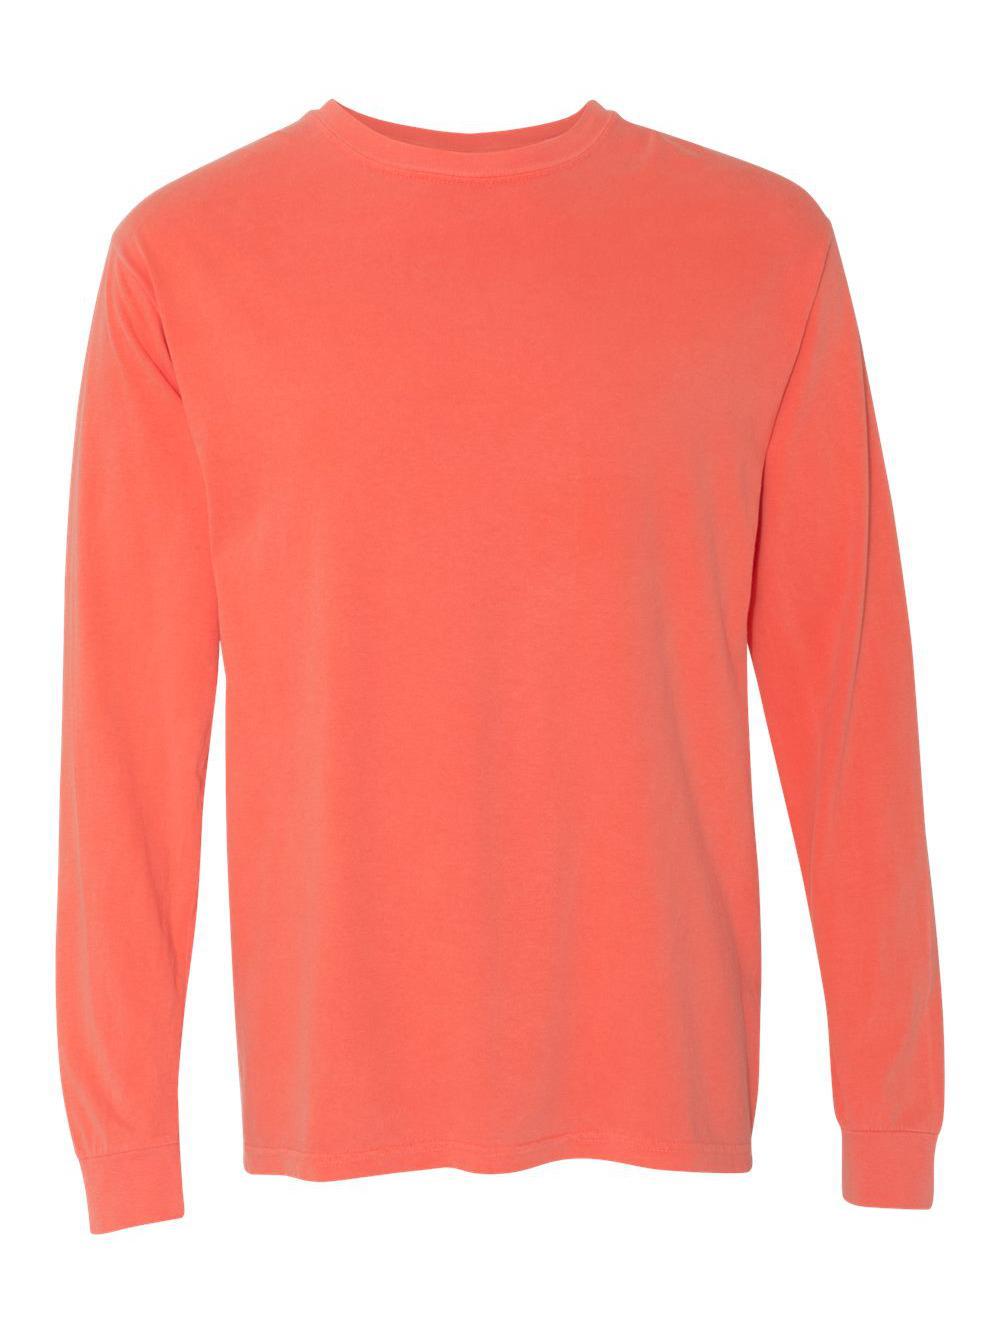 Comfort-Colors-Garment-Dyed-Heavyweight-Ringspun-Long-Sleeve-T-Shirt-6014 thumbnail 18